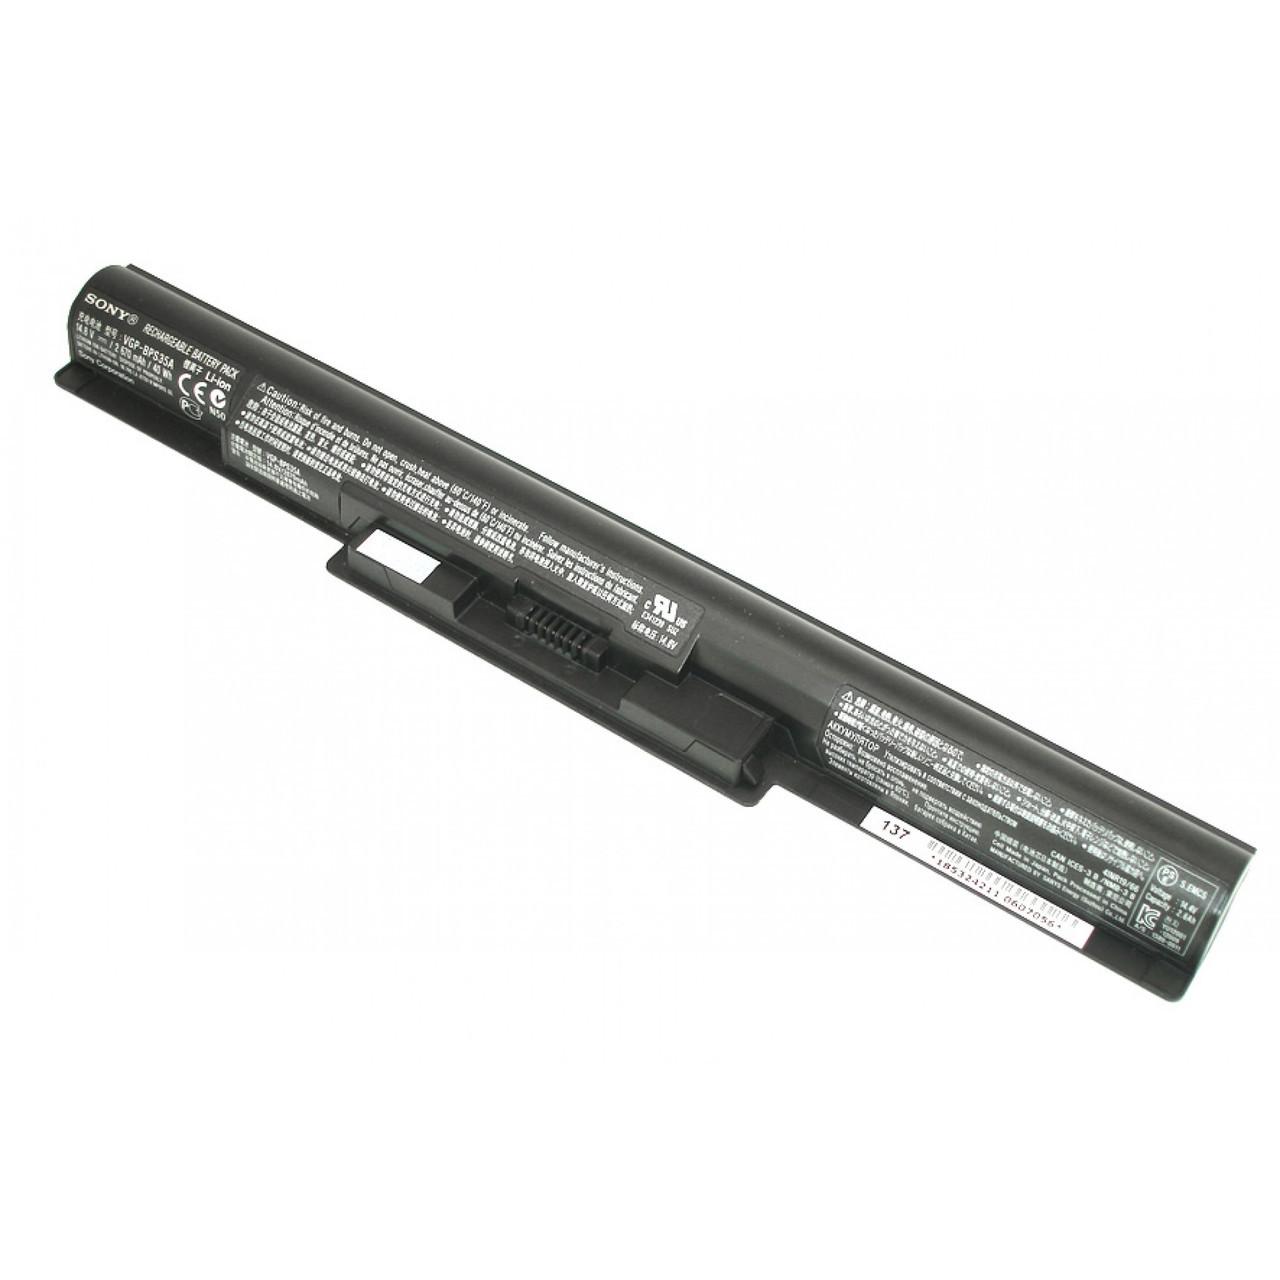 Аккумулятор для ноутбука Sony VGP-BPS35A (14.8V 2200 mAh)